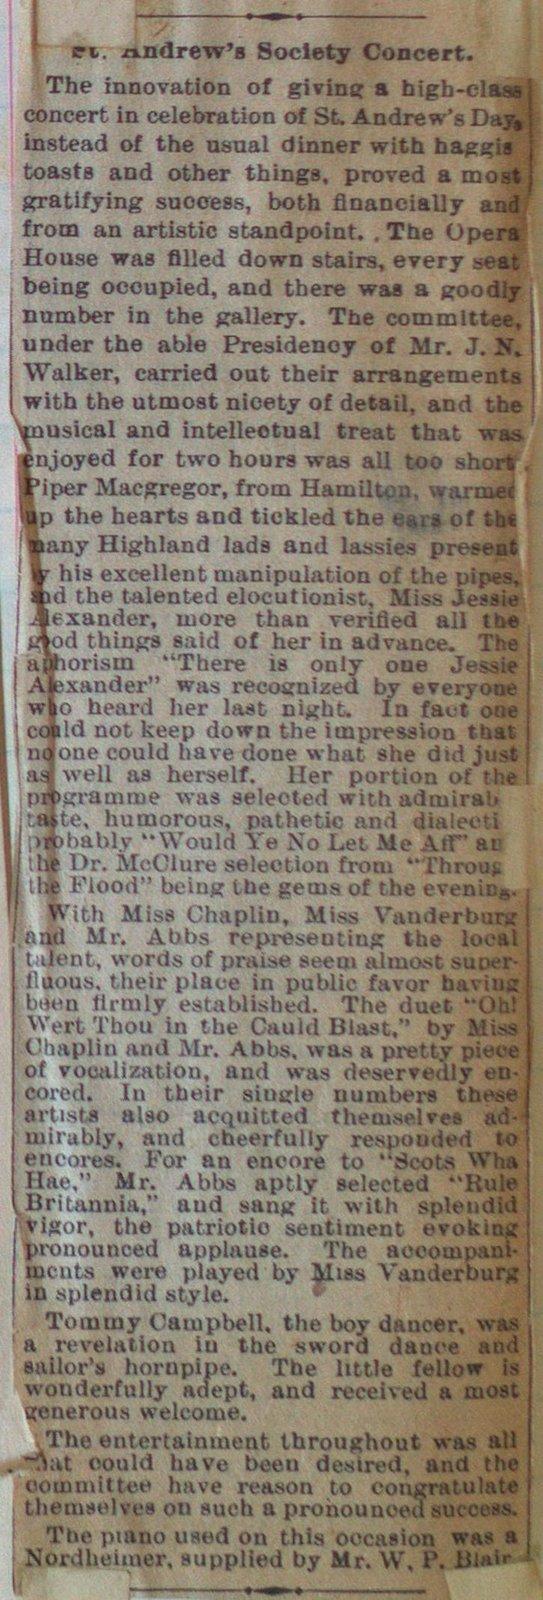 Teresa Vanderburgh's Musical Scrapbook #2 - Review of the St. Andrew's Society Concert